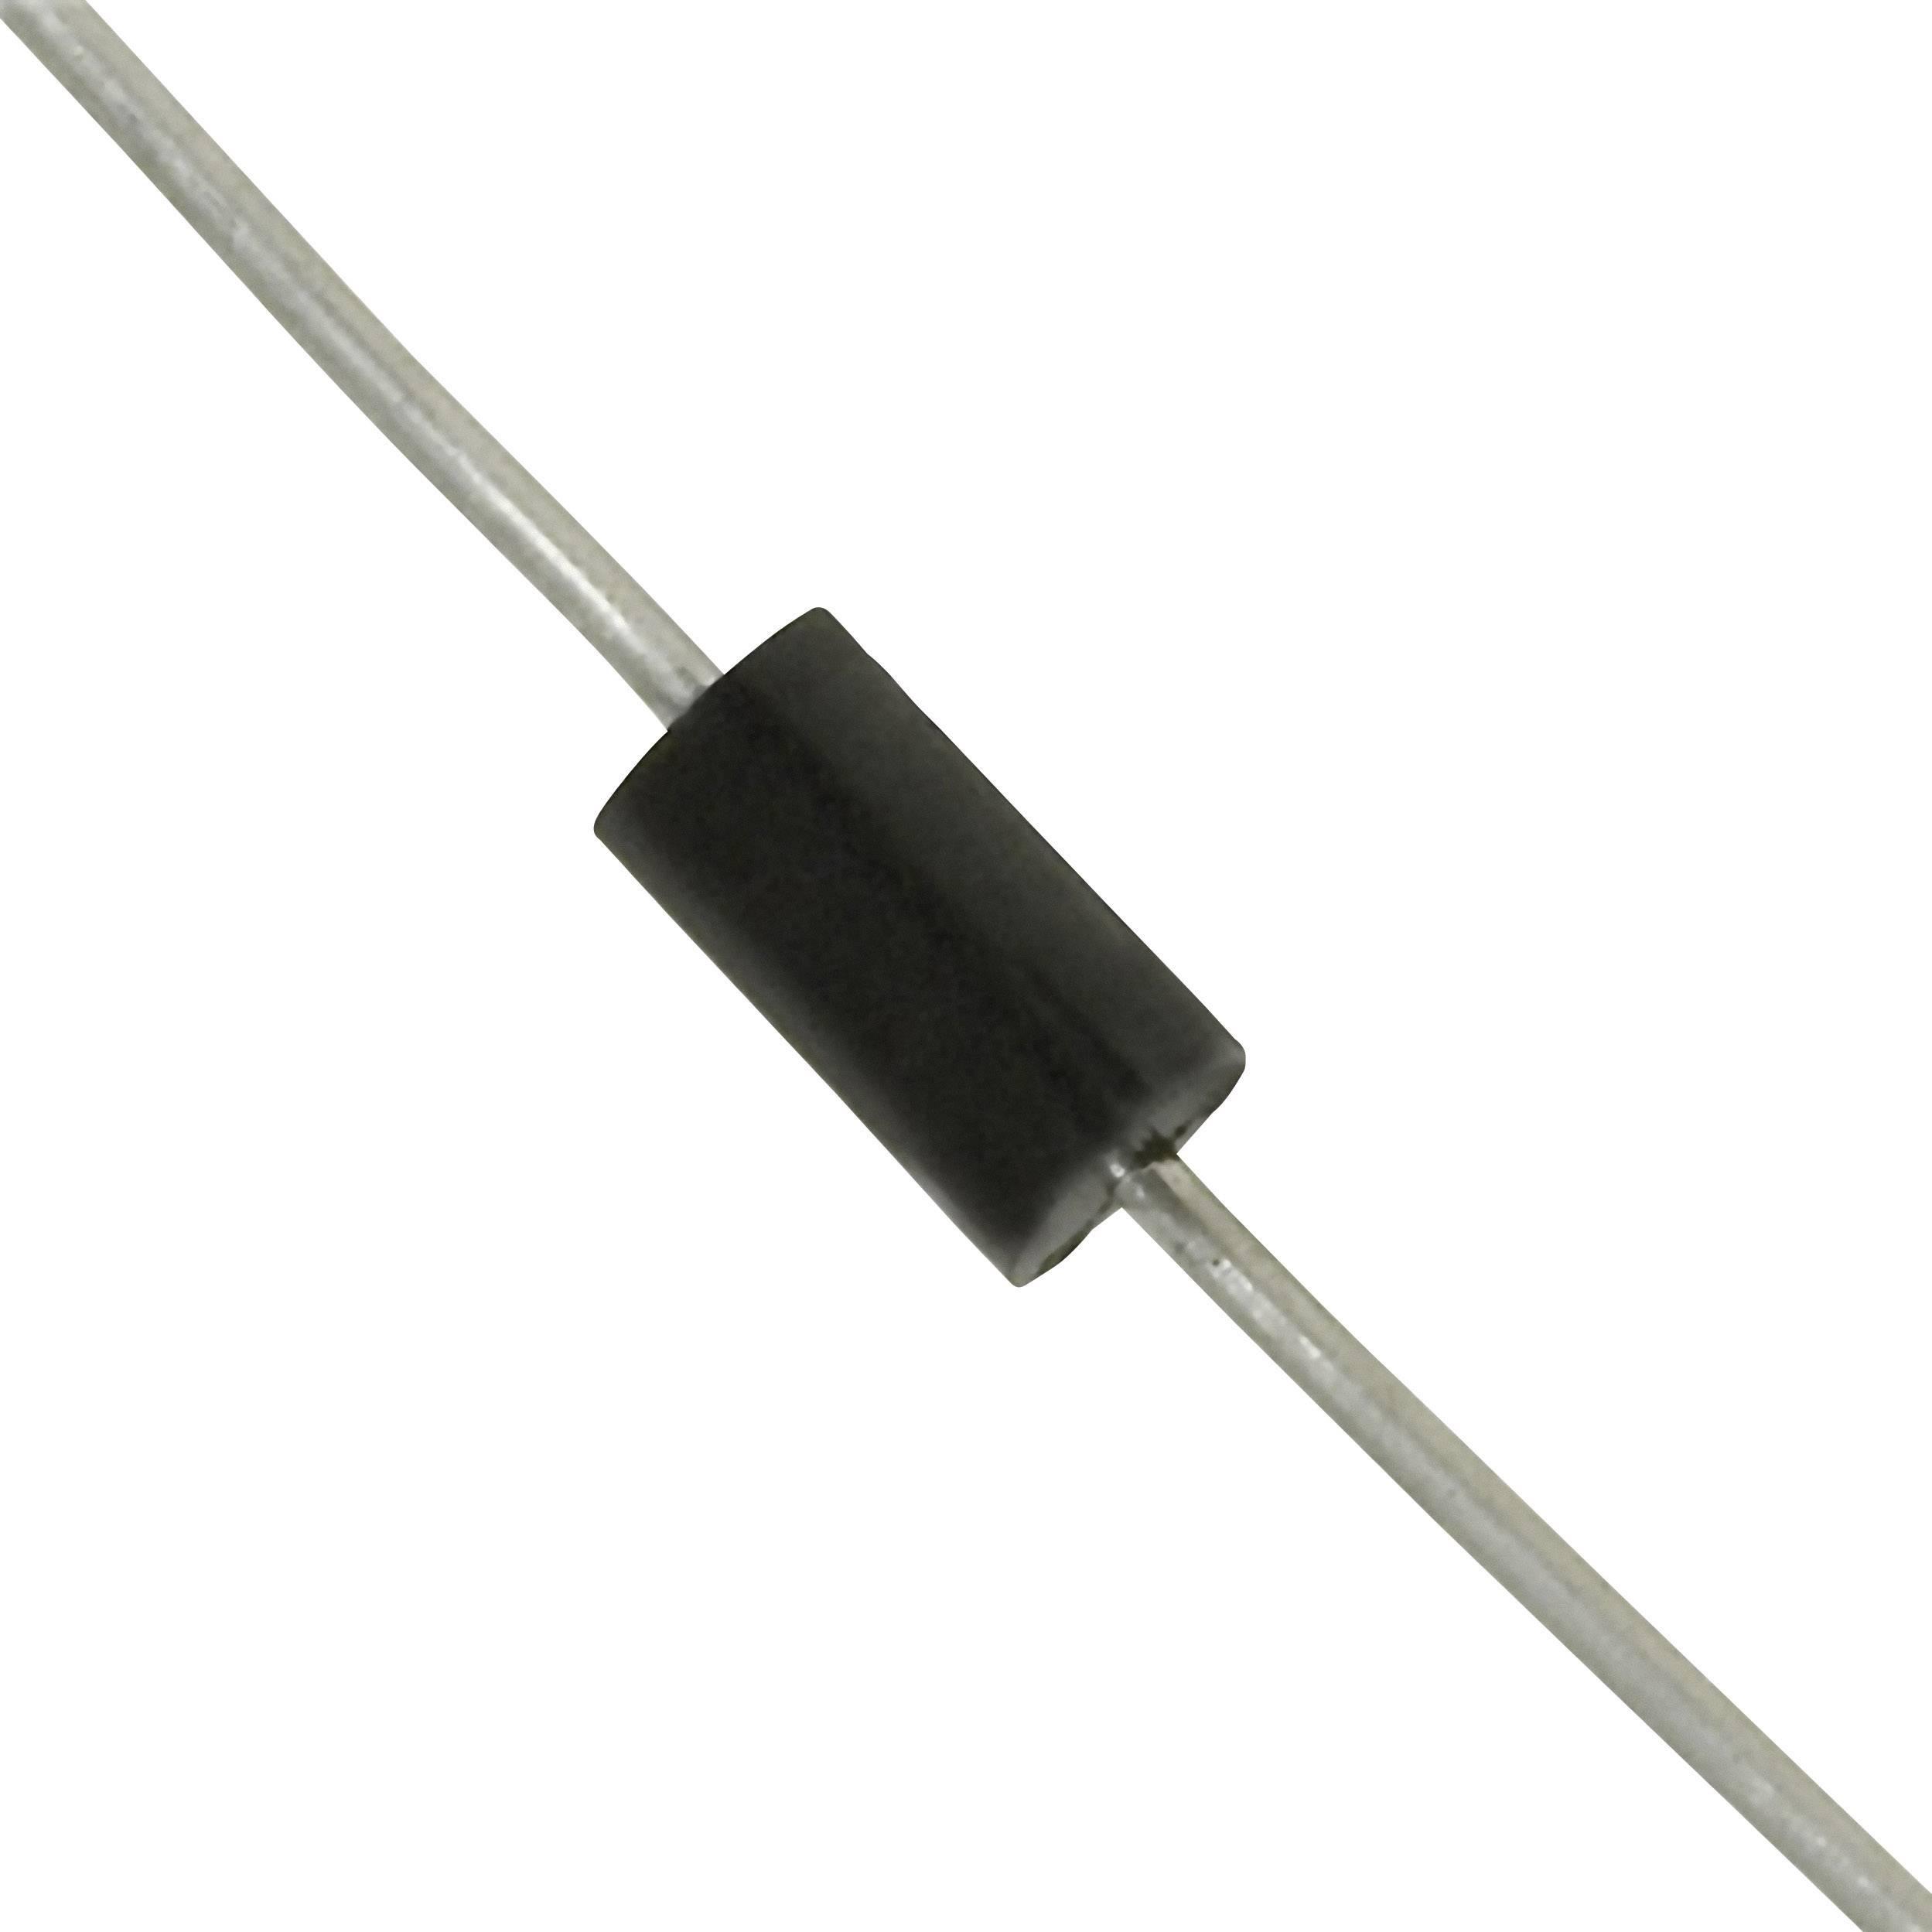 TVS dioda Littelfuse P6KE39A, U(Db) 37.1 V, I(PP) 11.3 A